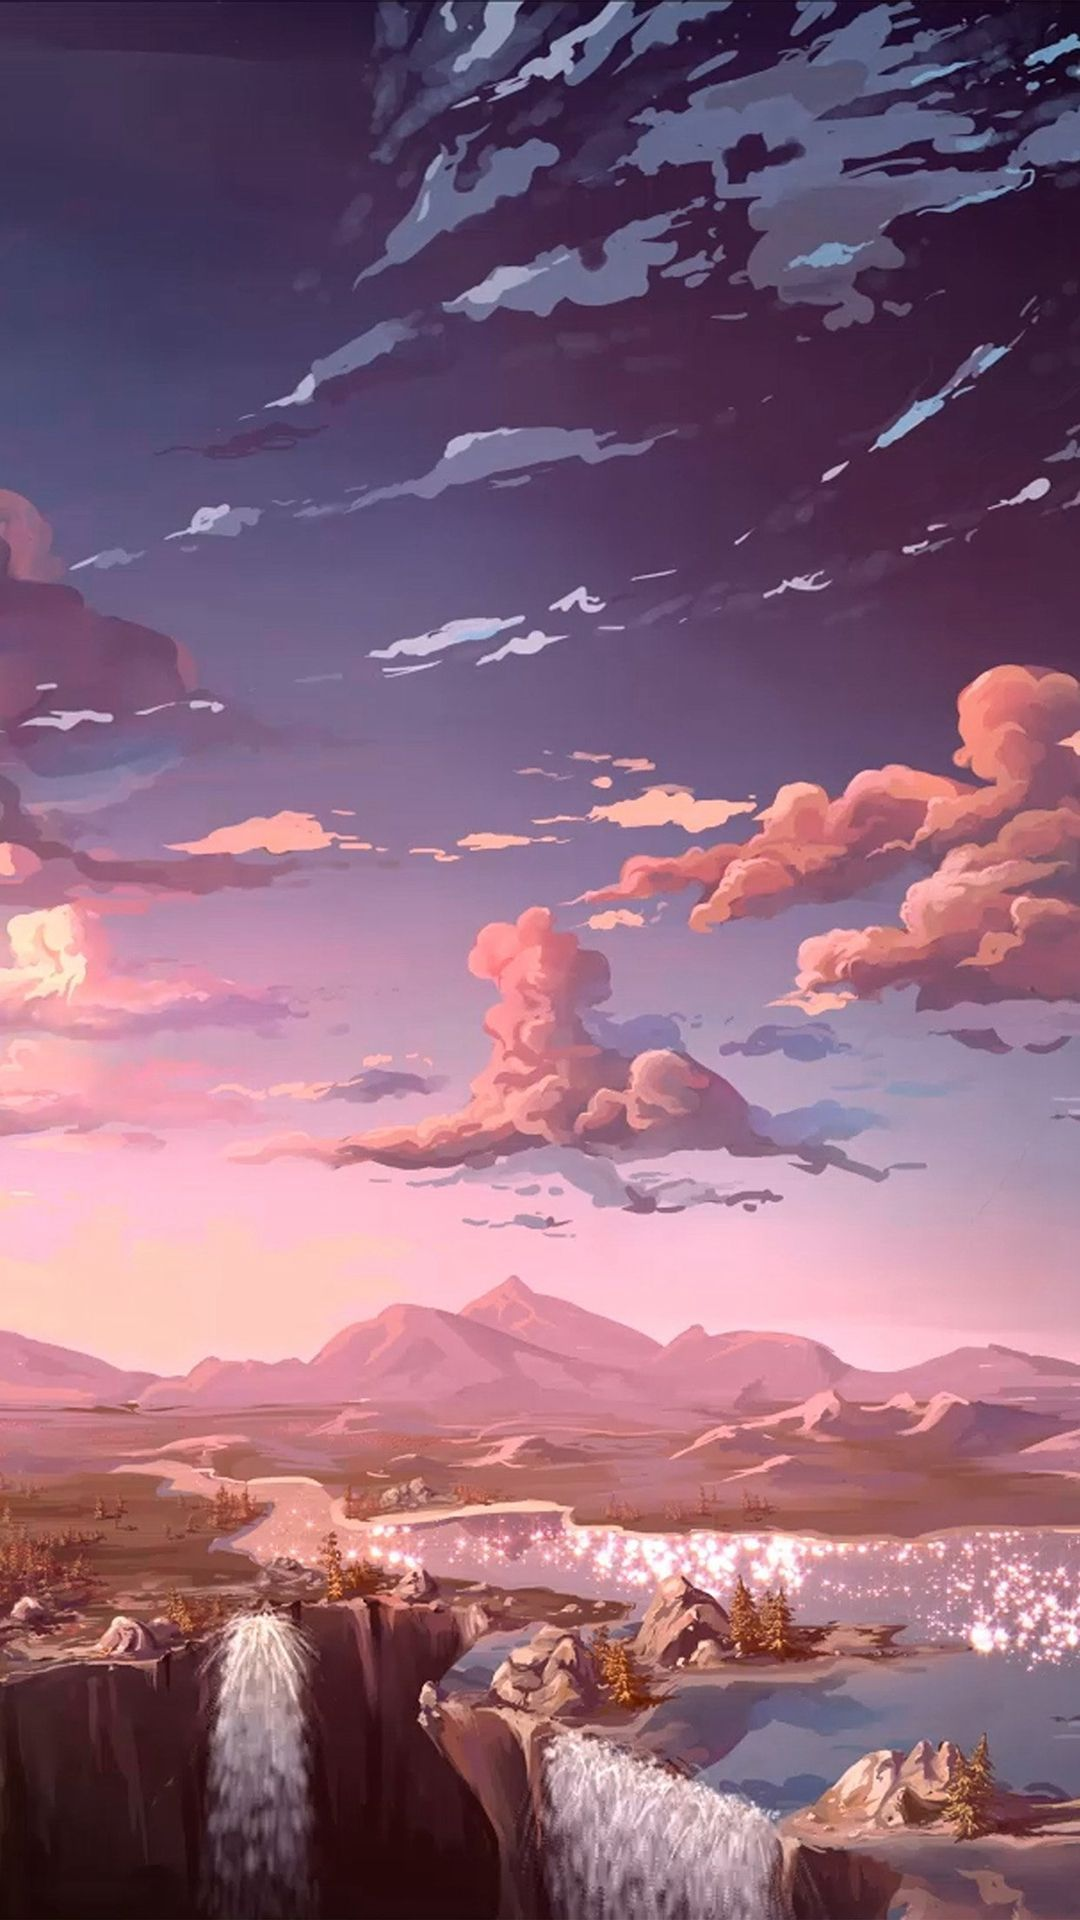 14 Anime Aesthetic Wallpaper Ipad Scenery Wallpaper Anime Scenery Fantasy Landscape 14 wallpaper of anime